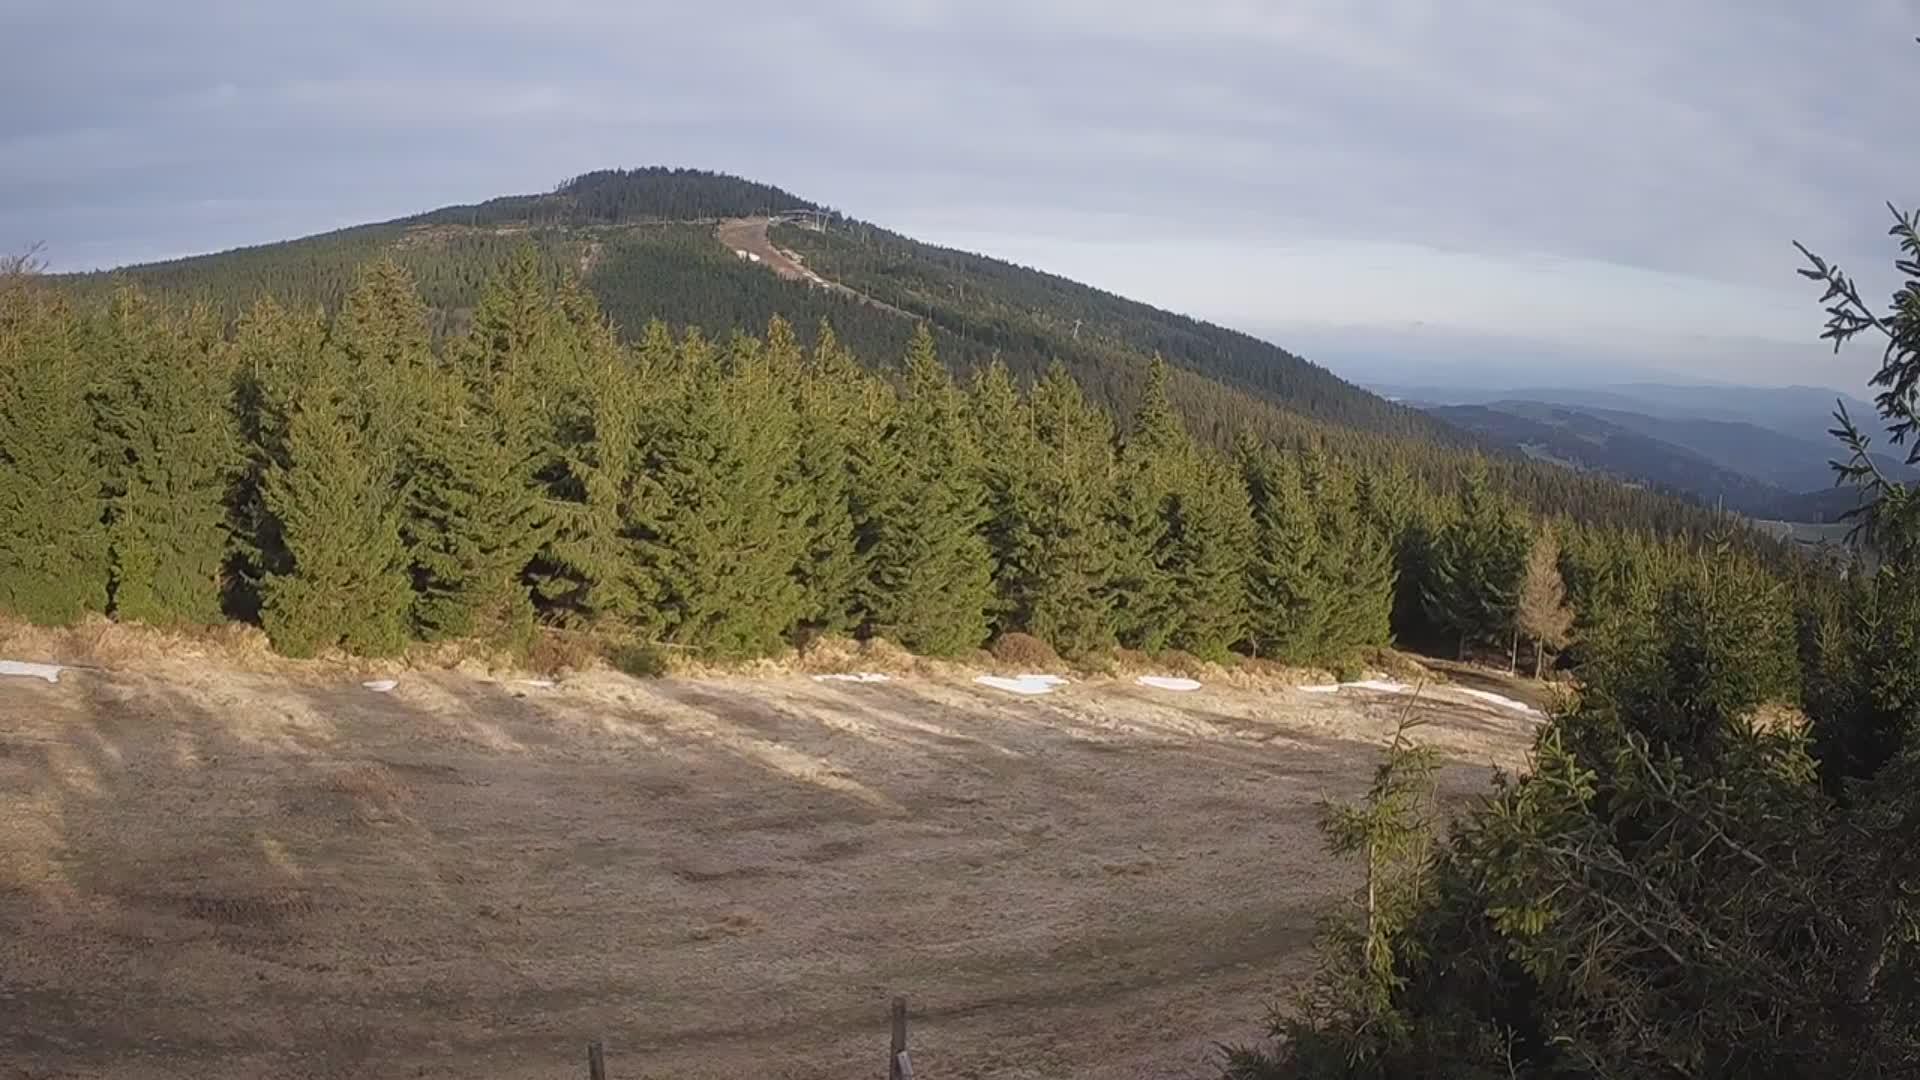 Webcam Ski Resort Czarna Gora cam 7 - Snieznik Mountains